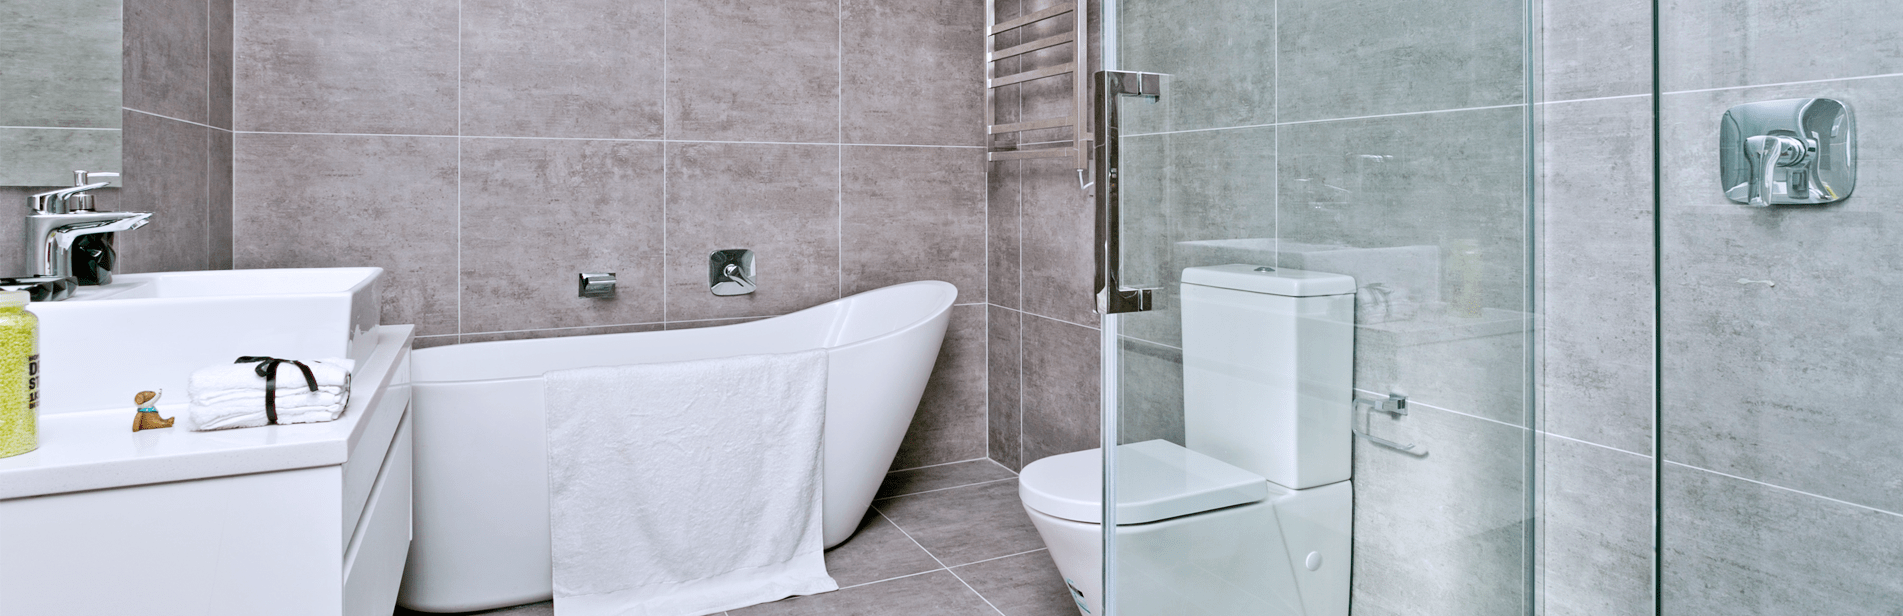 bathroom-1, Kitchen Renovation, Bathroom Renovation, House Renovation Auckland